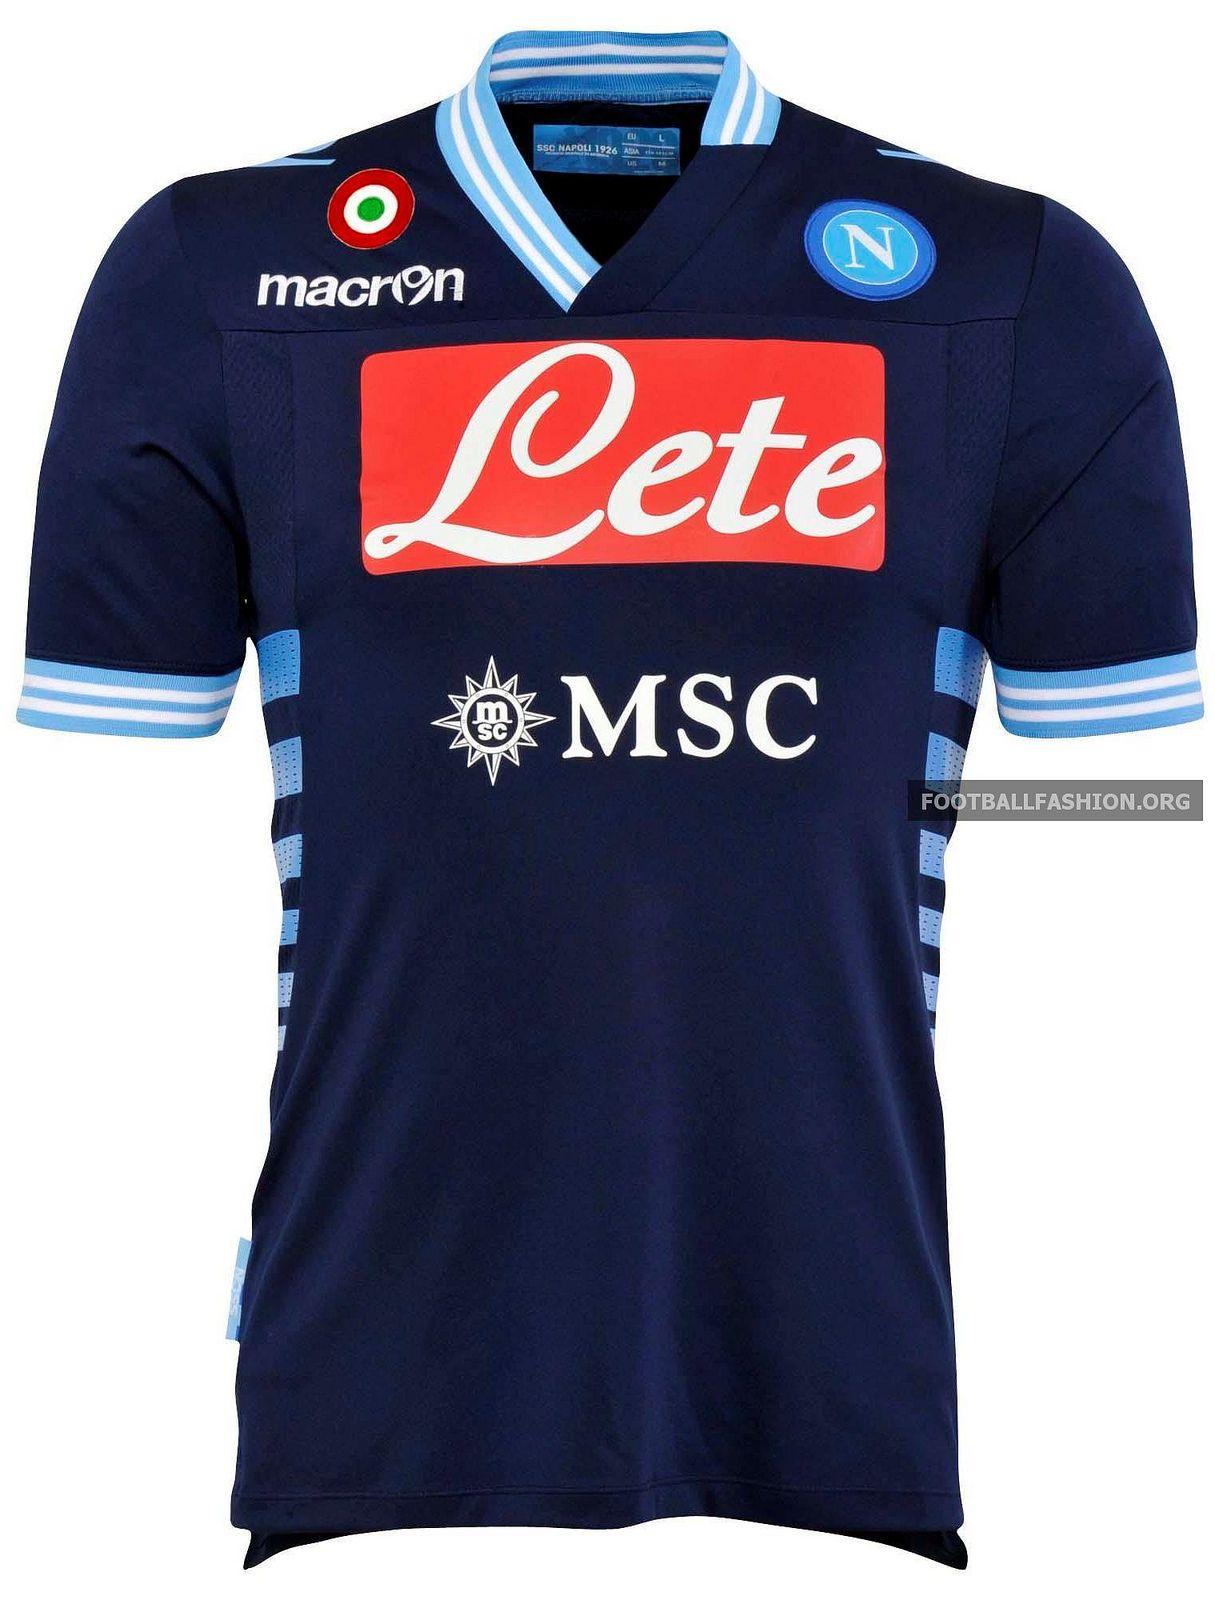 SSC Napoli Macron 2012 13 Away Kit Remeras De Futbol 13a4ada9ac202